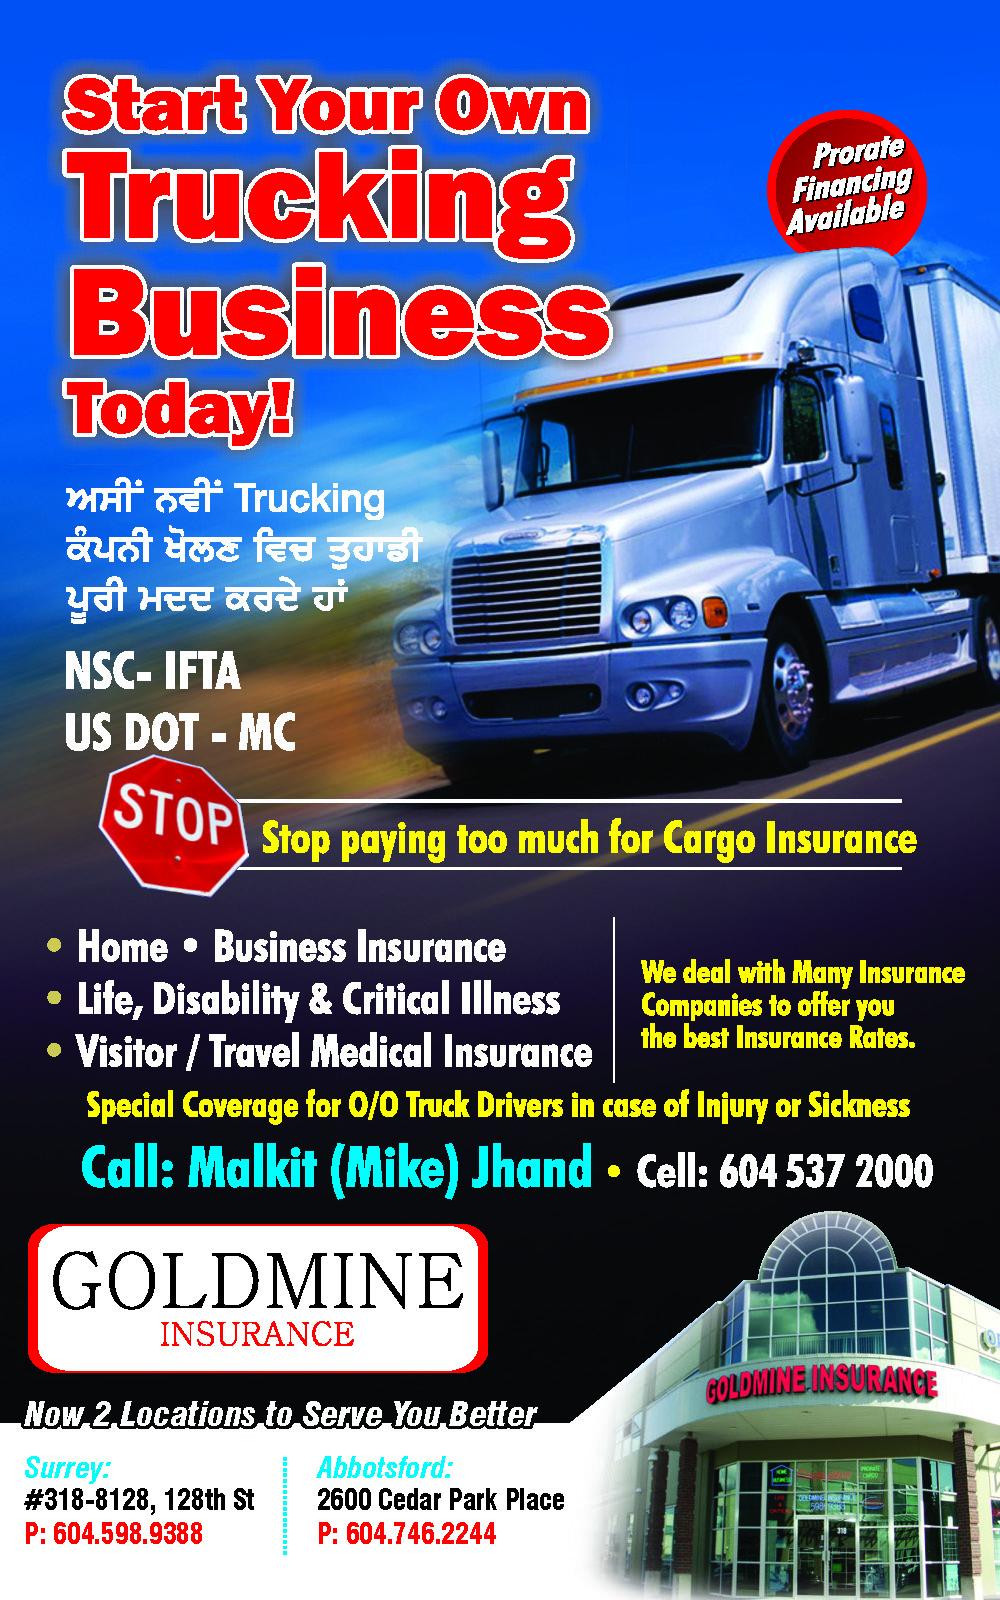 goldmine-insurance-services-ltd-PoqzehJ.jpeg